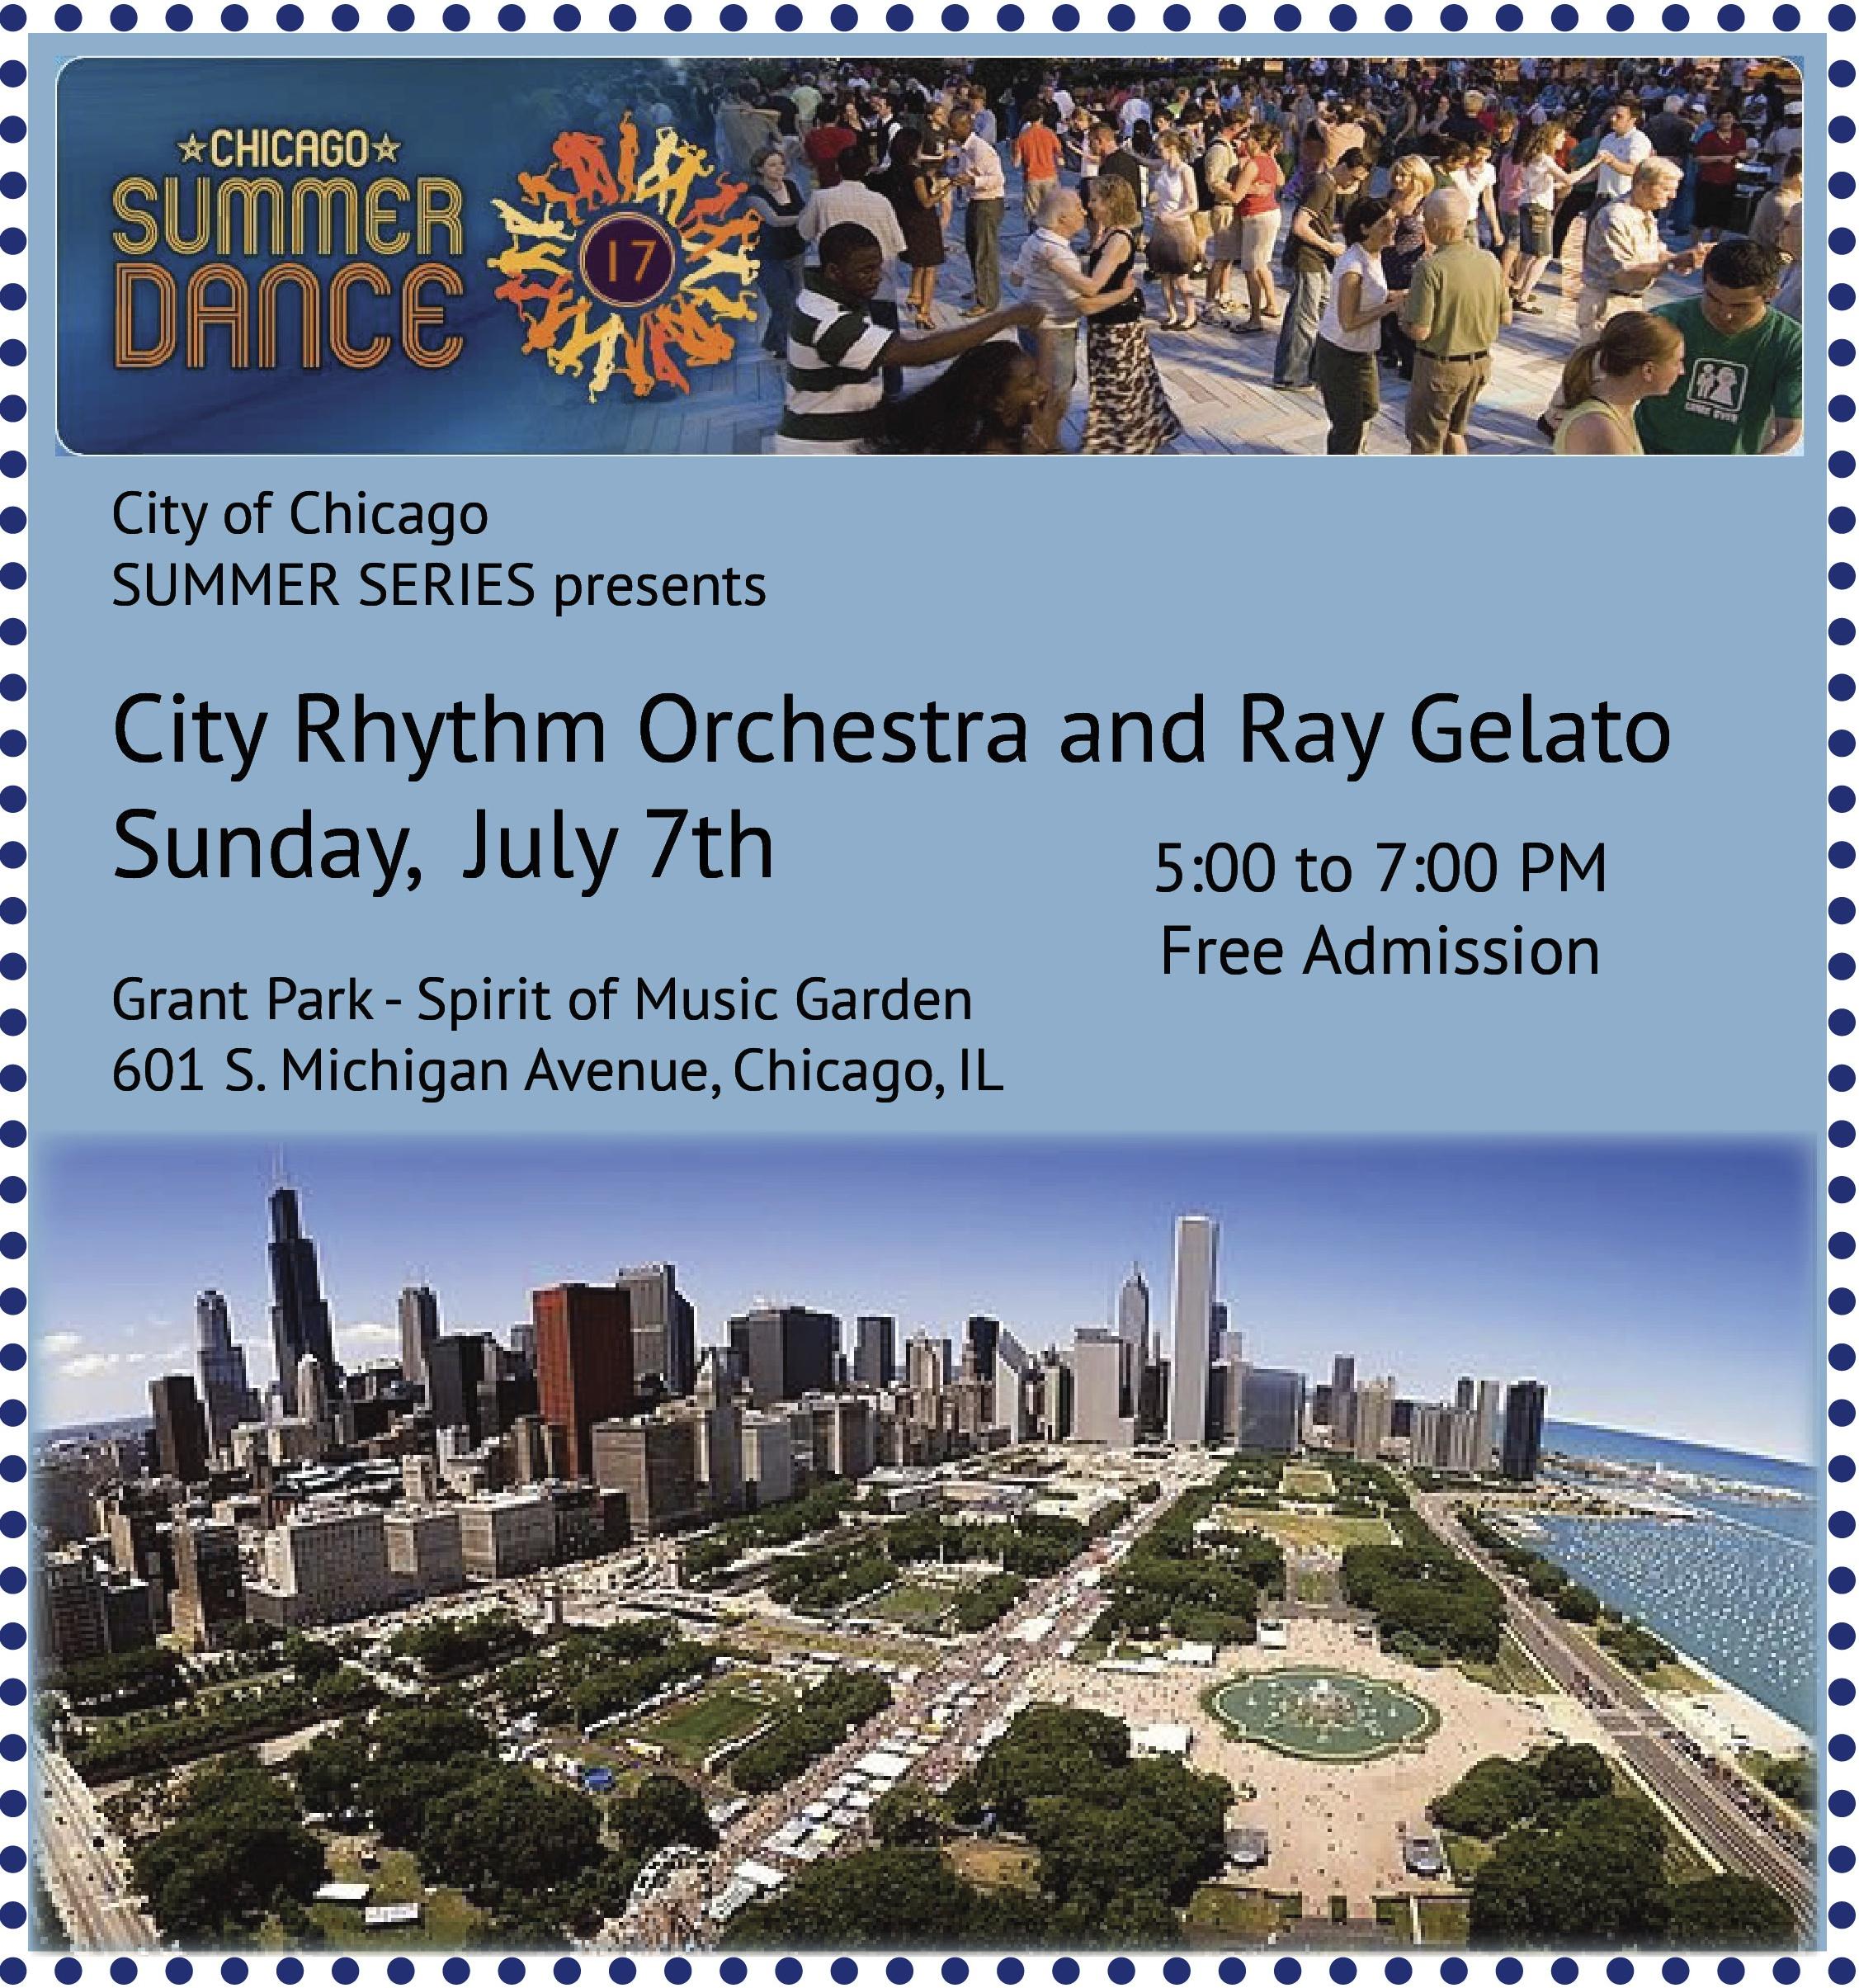 Copy of Grant Park, Chicago